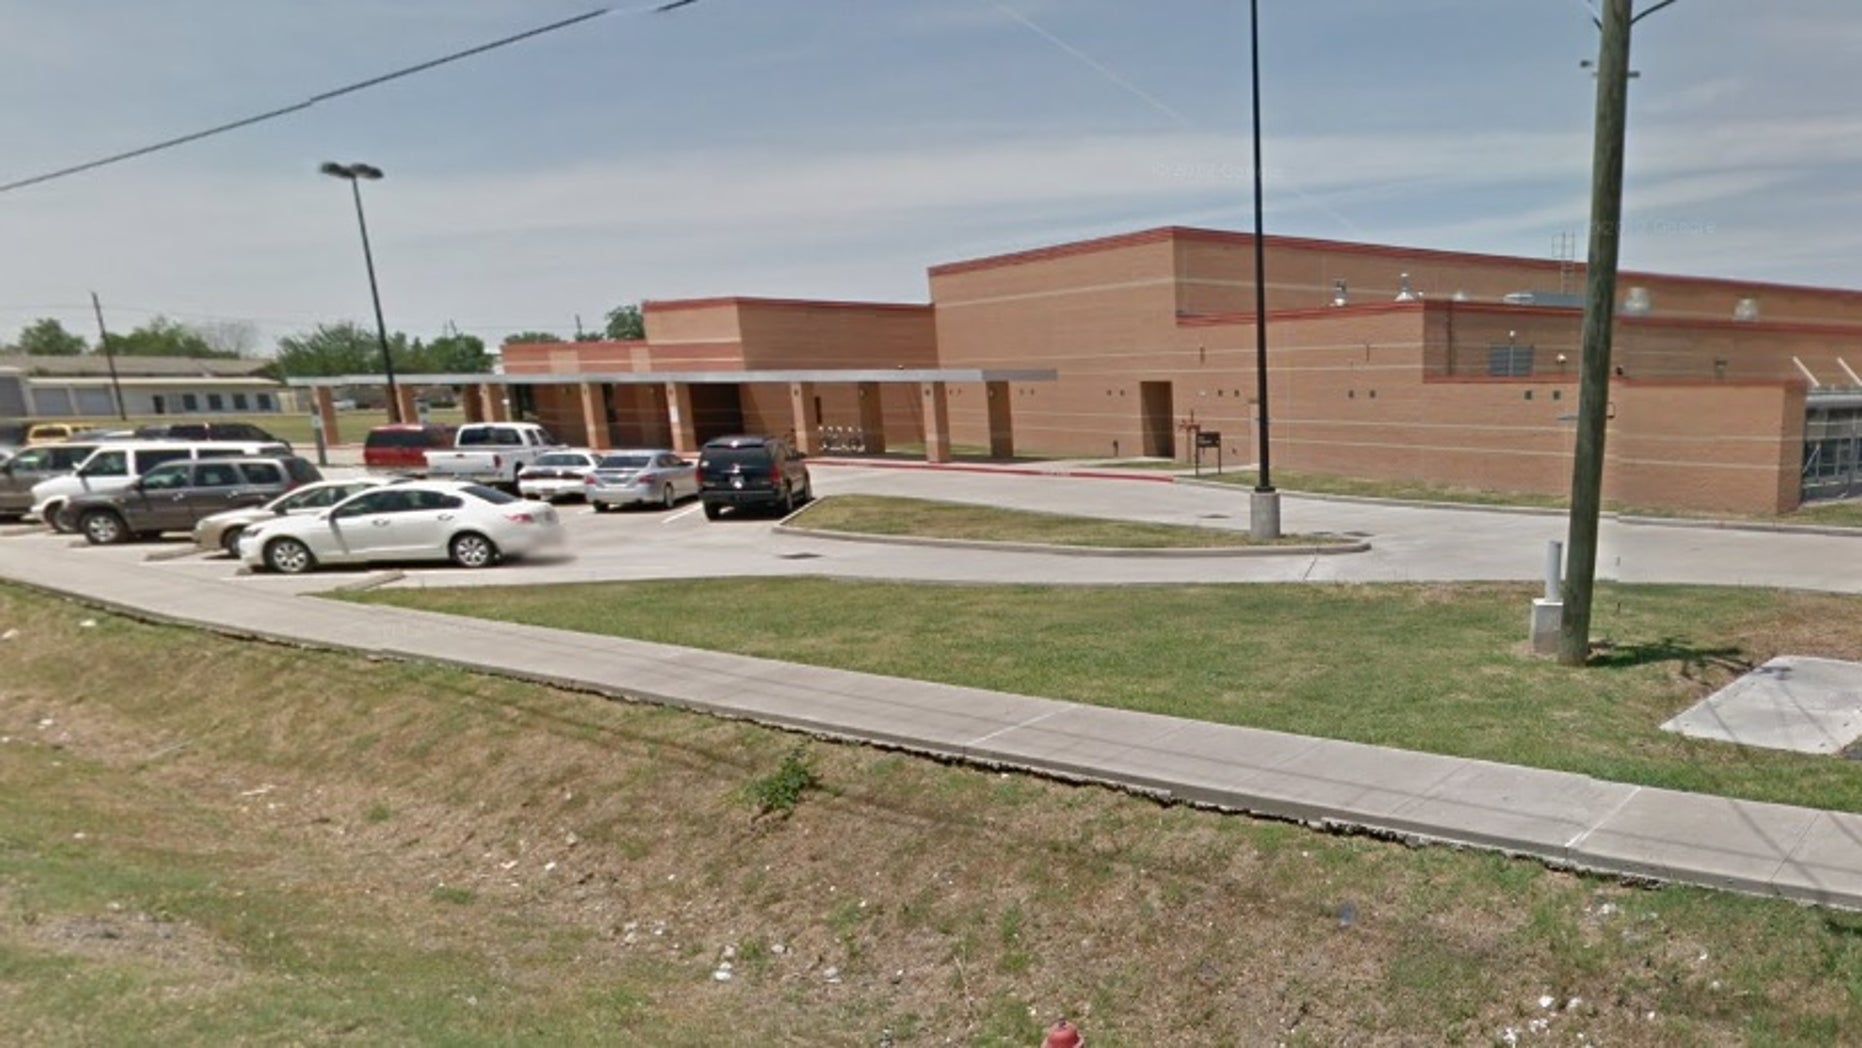 Sheldon Elementary School.